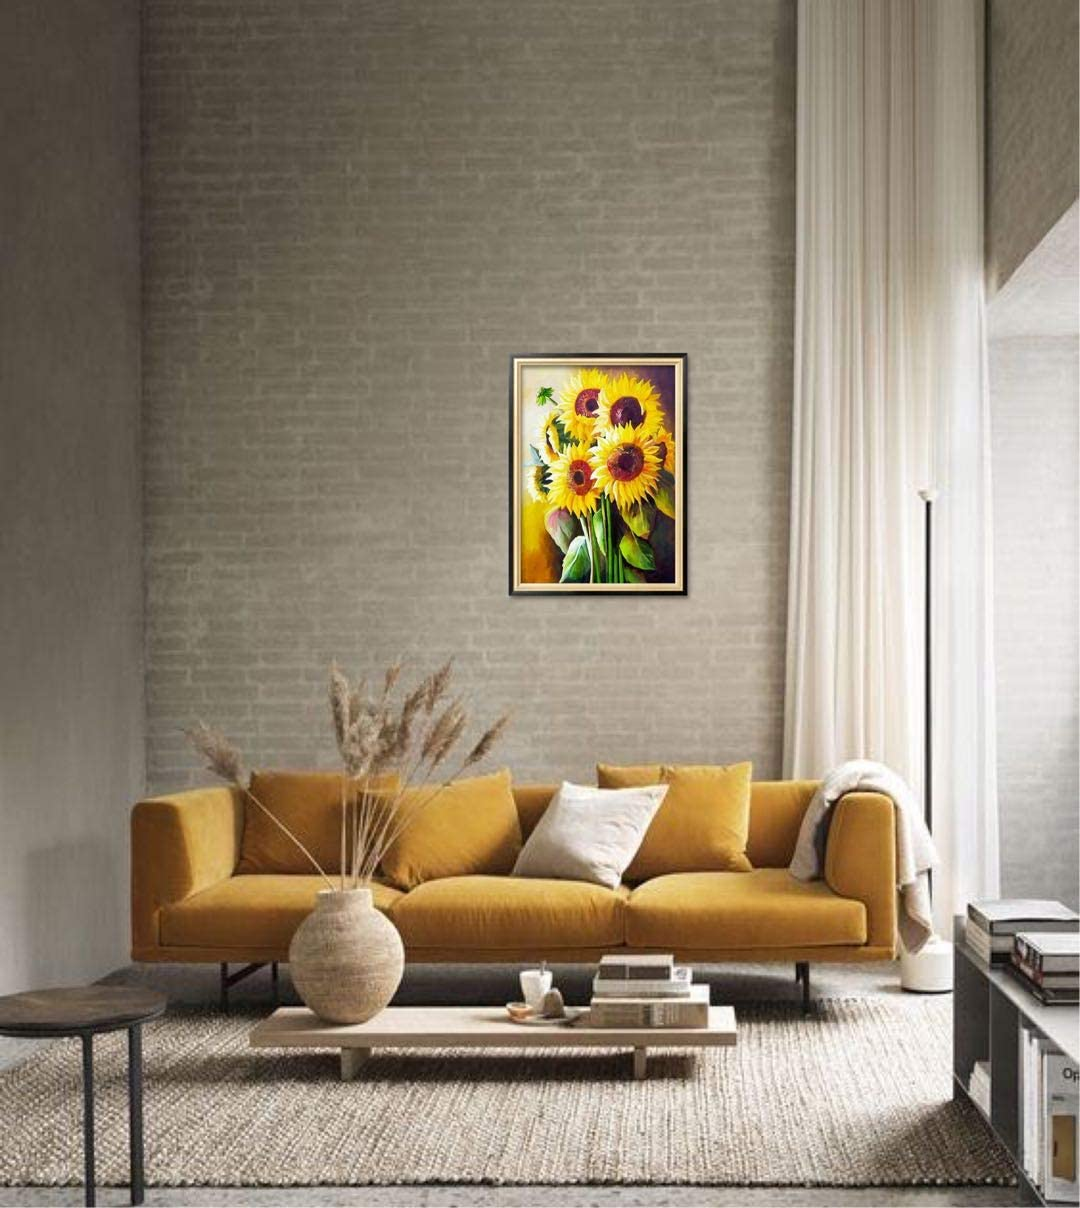 Deer Sosolong Deer 5D Diamond Painting,Deer Diamond Art for Living Room Bedroom